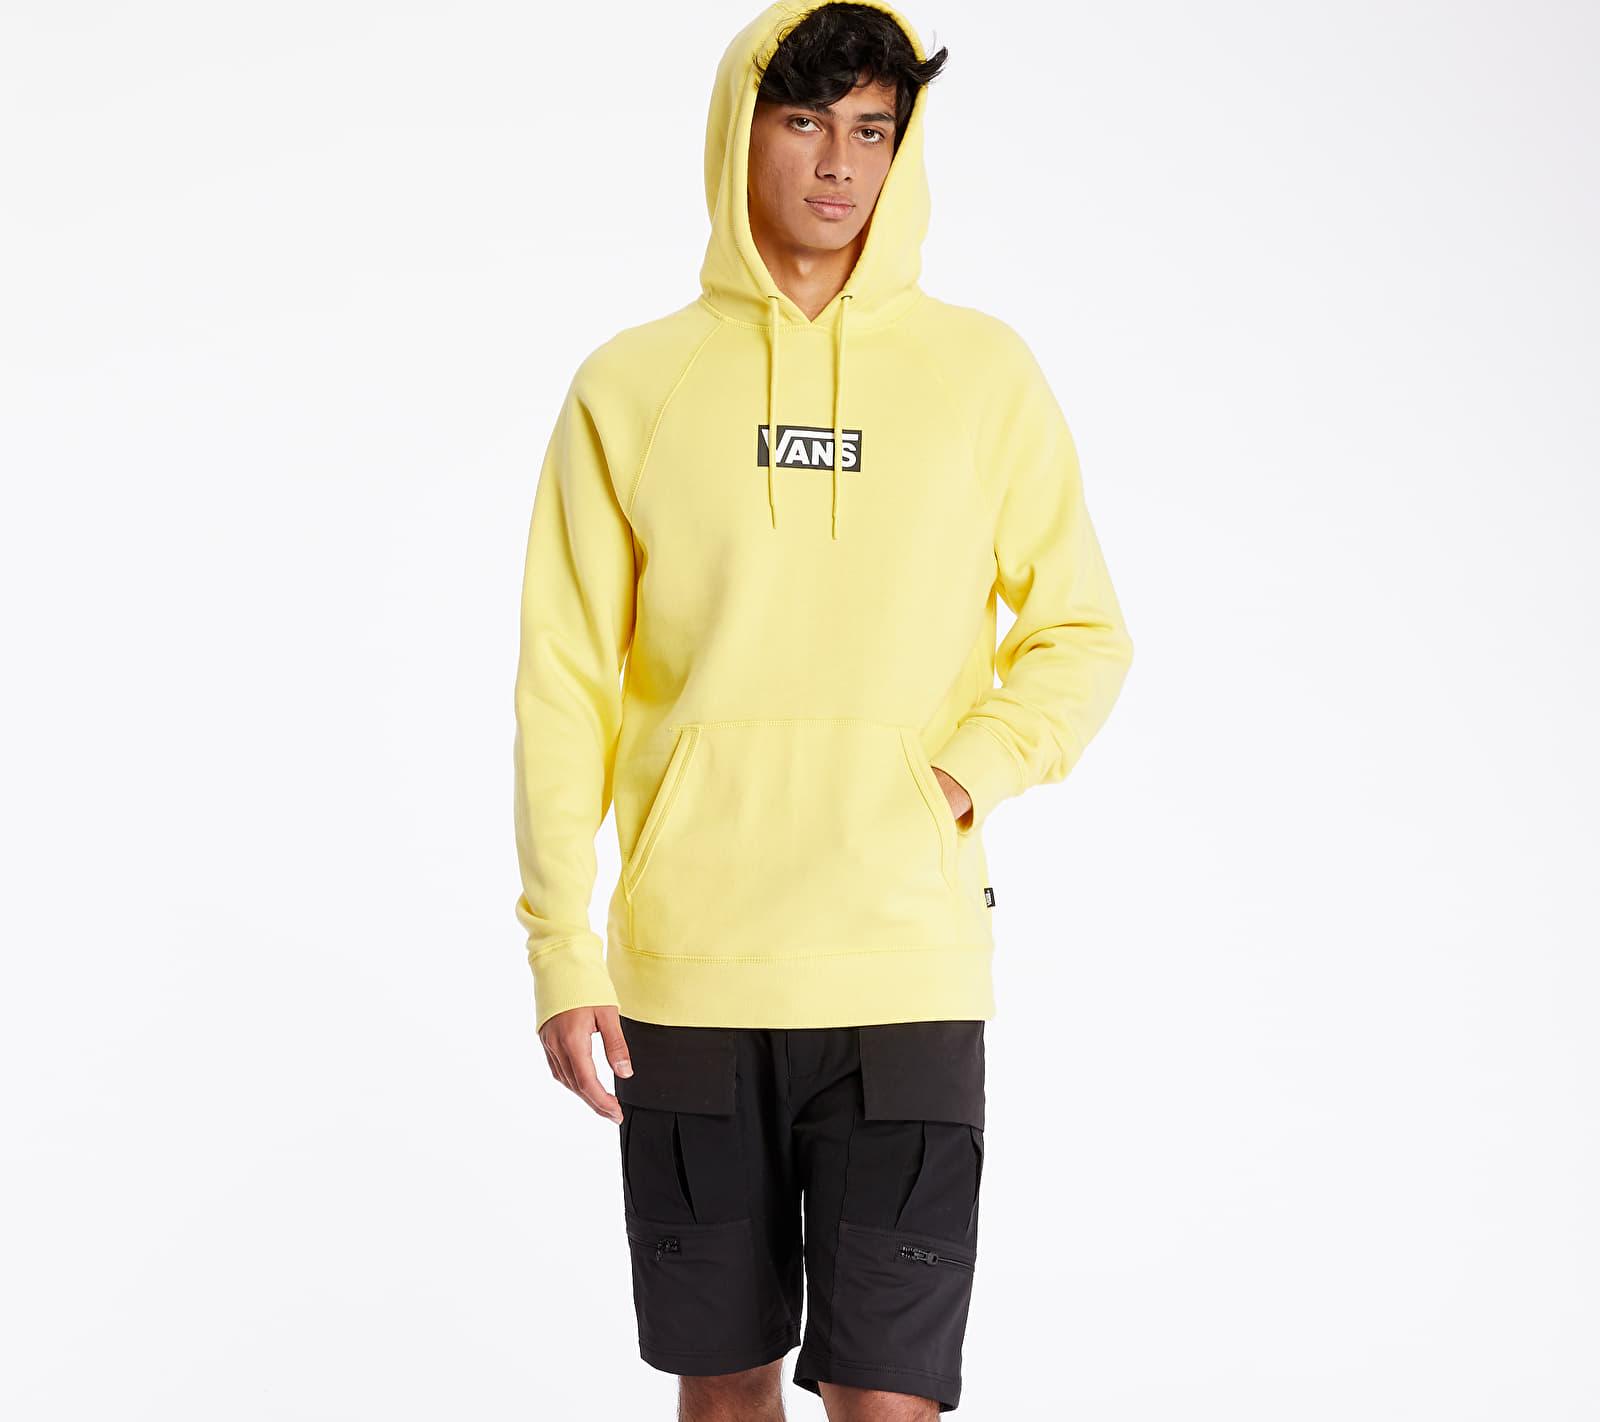 Vans Versa Standard Hoodie Yellow Cream